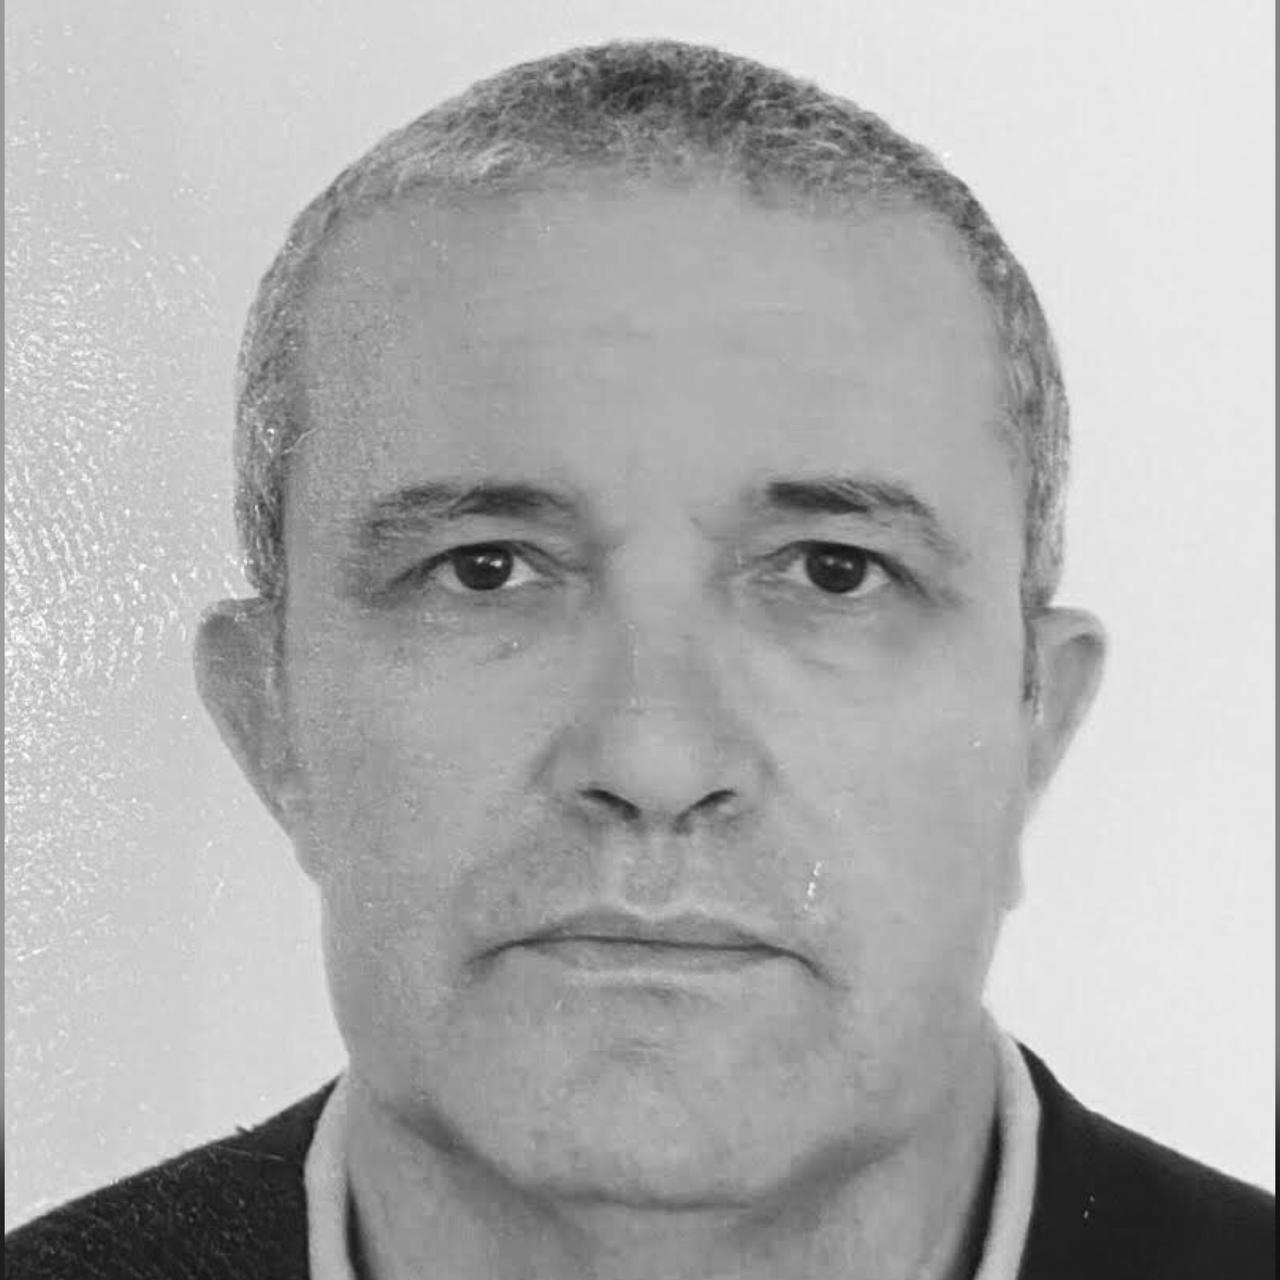 Mohammed Benayad